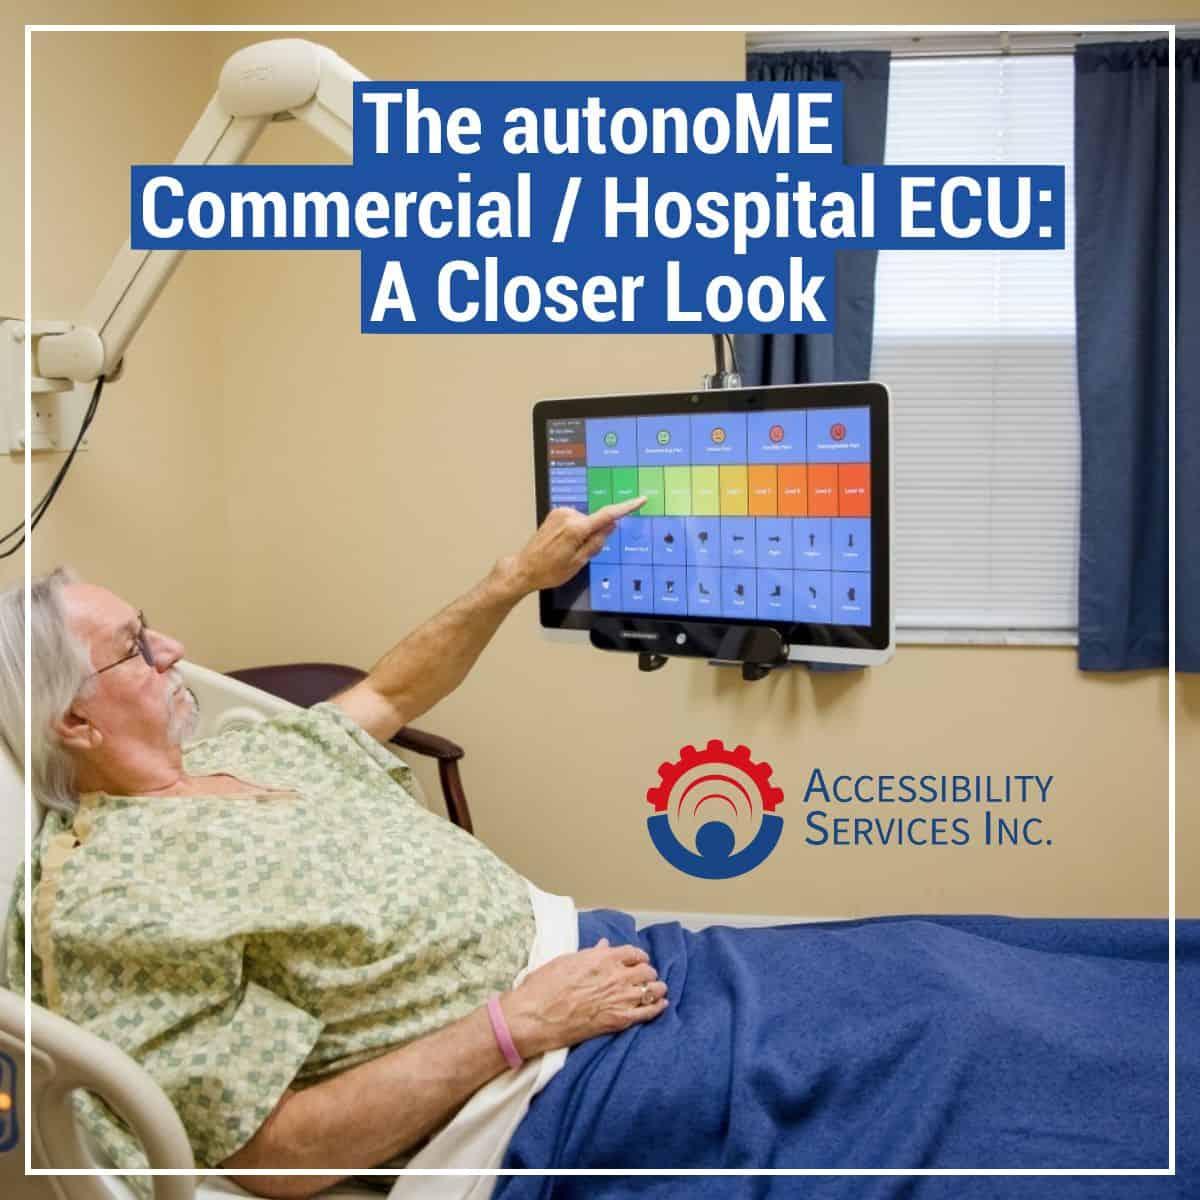 The autonoME Commercial / Hospital ECU: A Closer Look